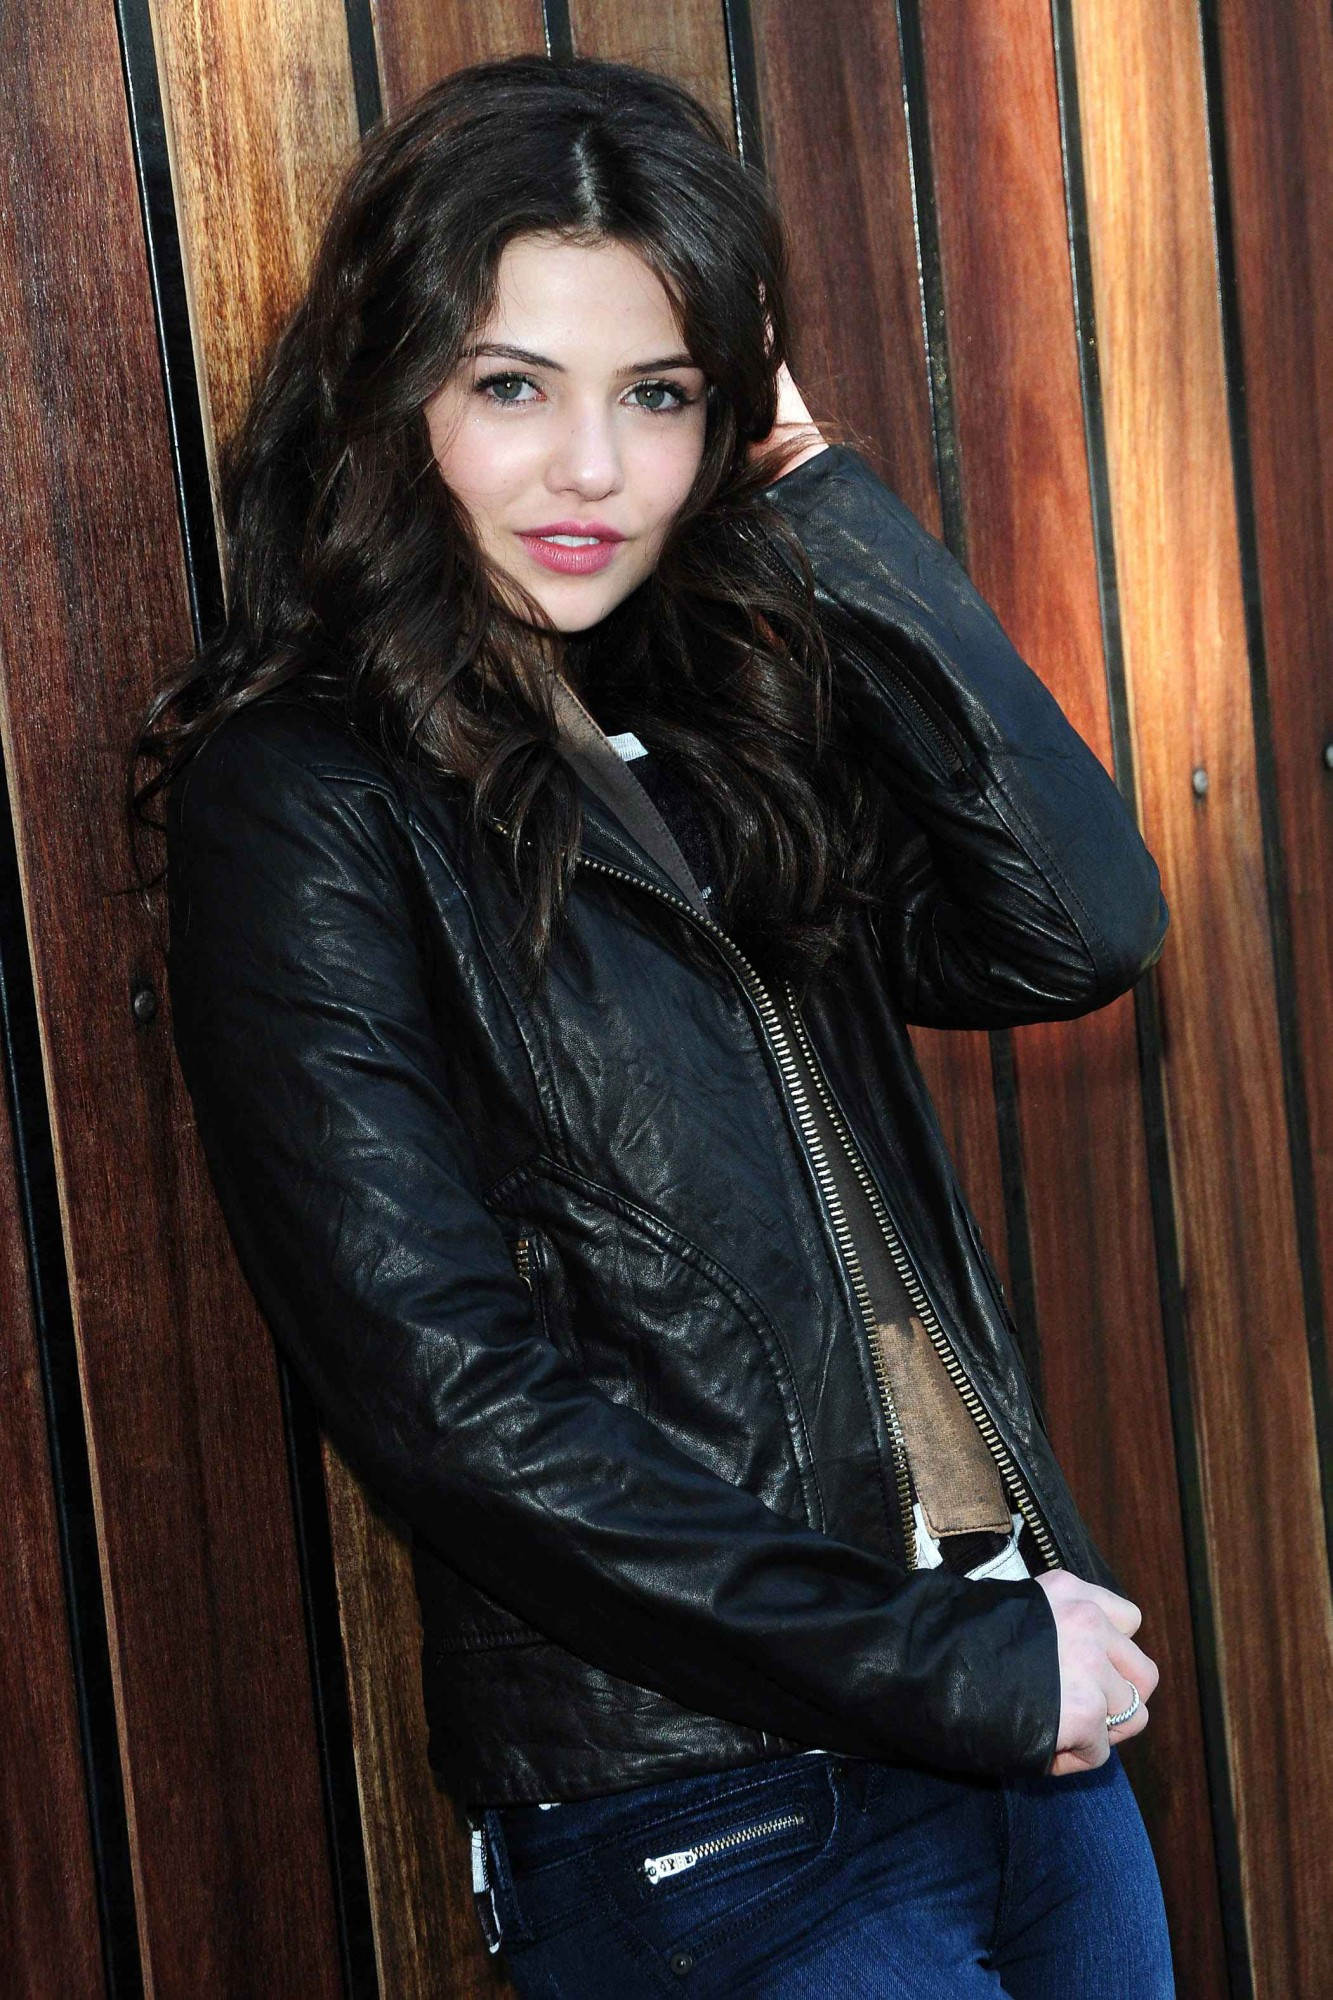 Danielle campbell vampire diaries - photo#23